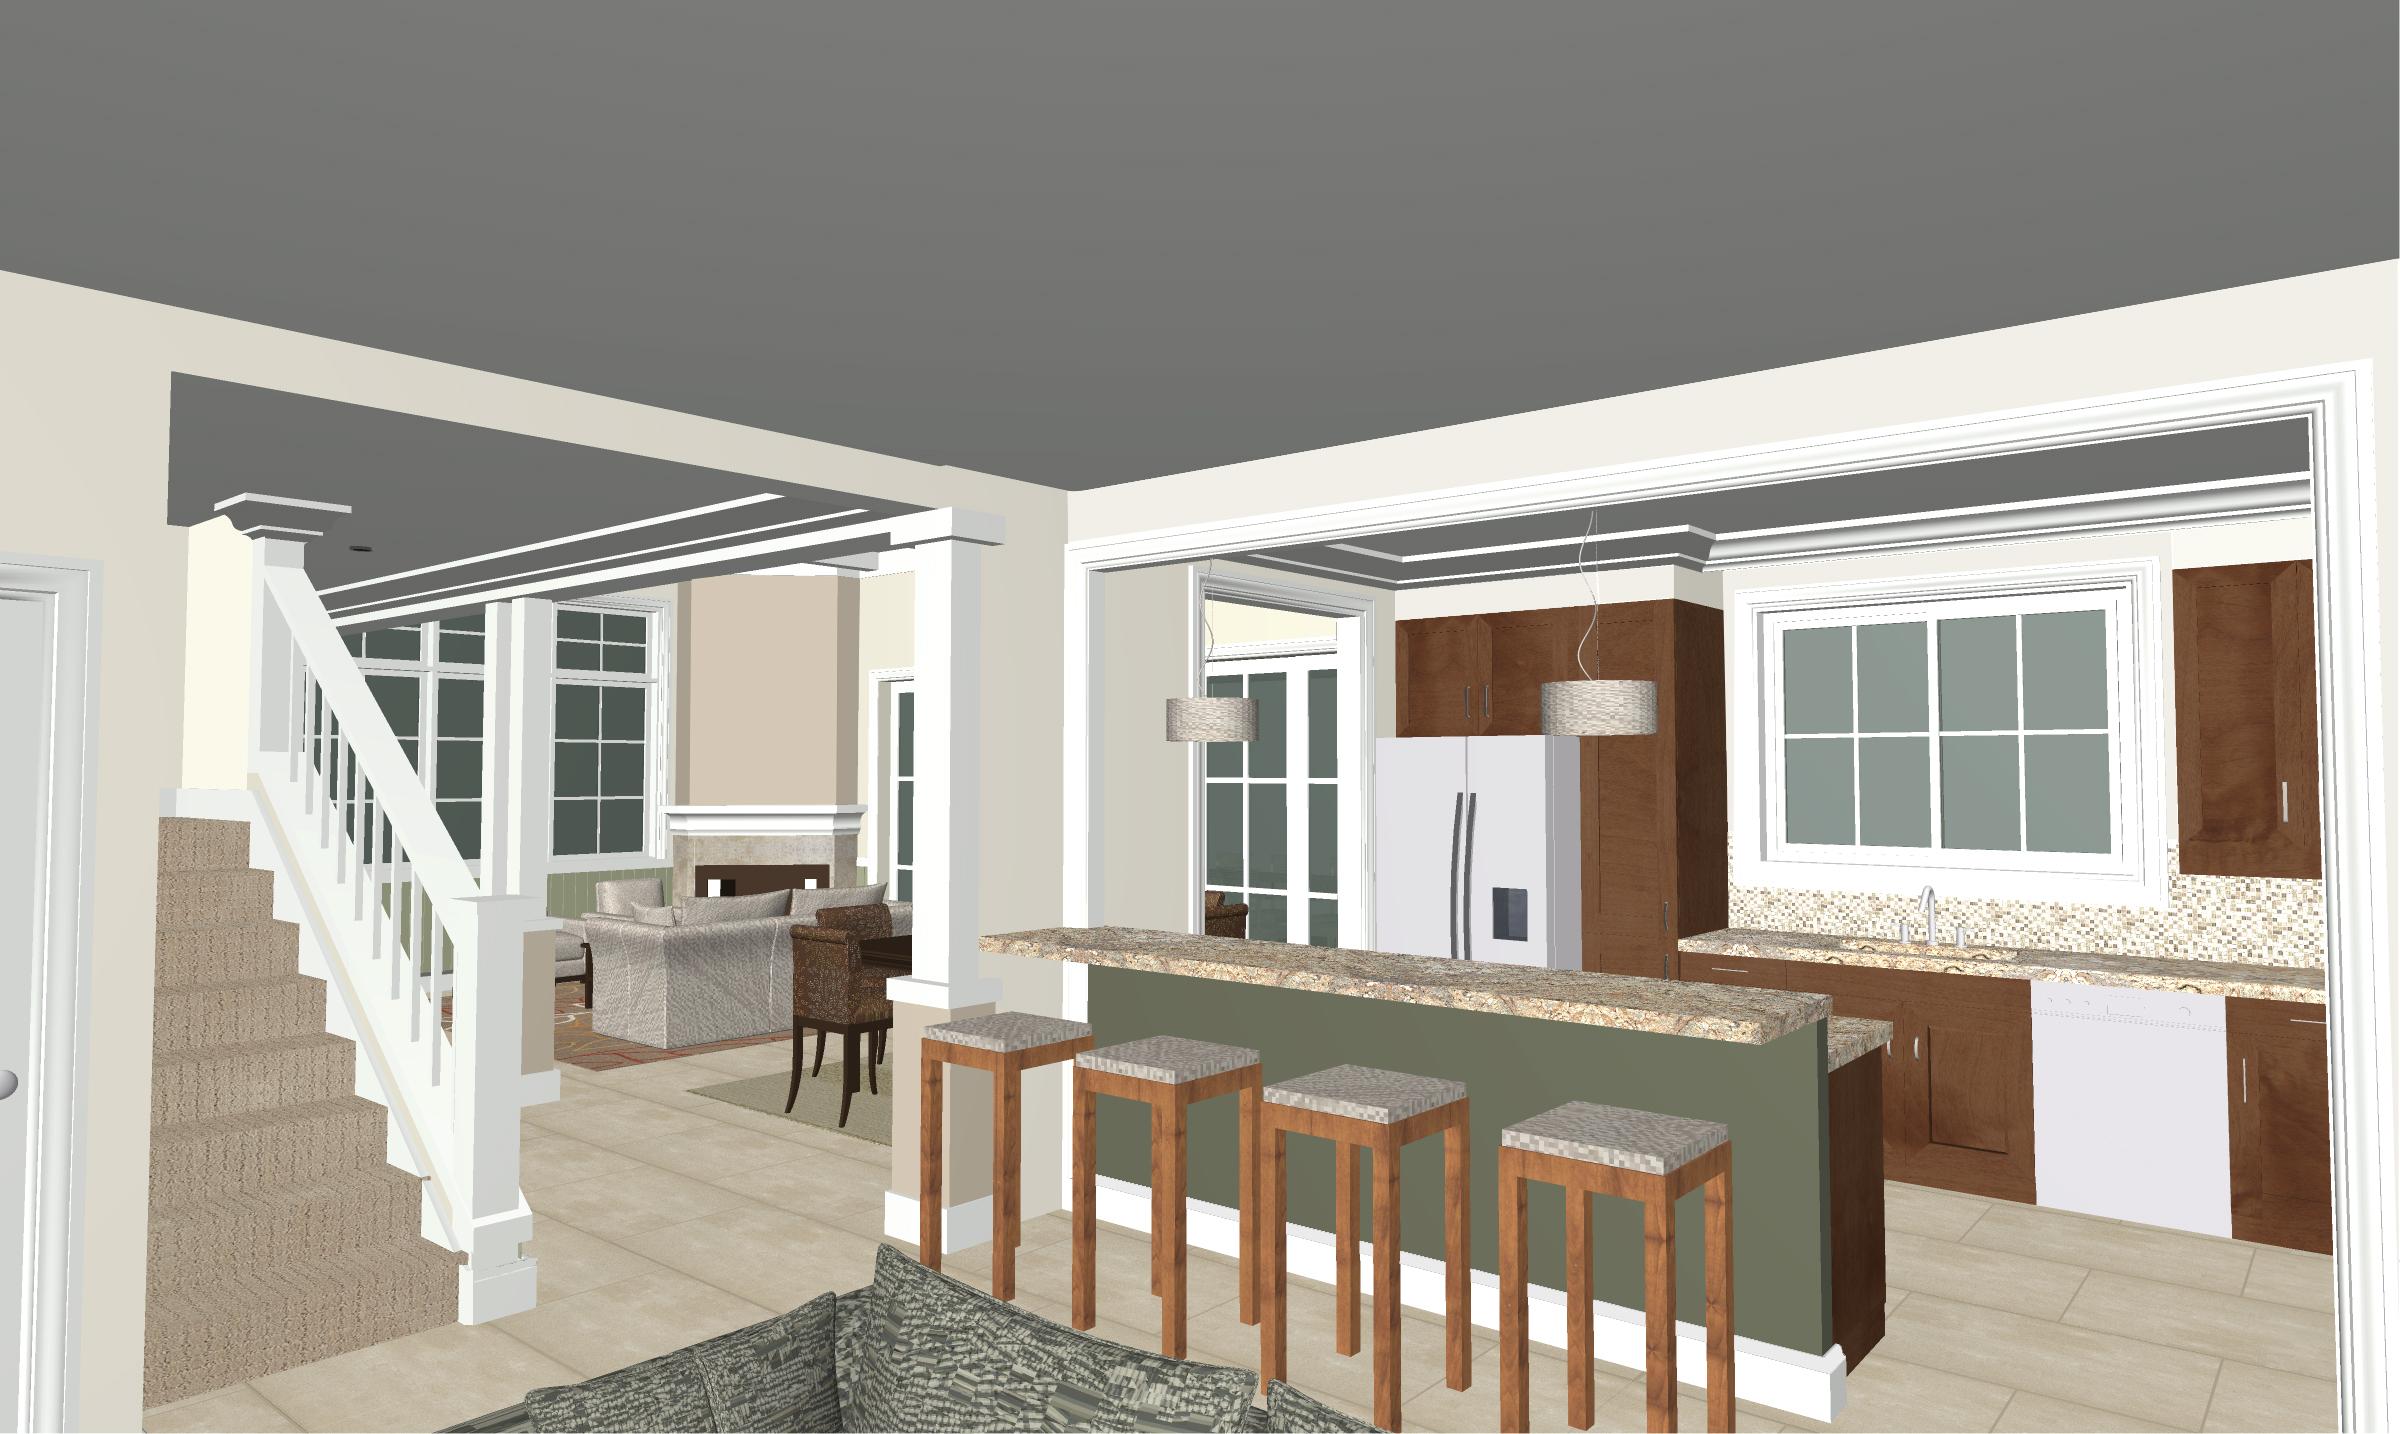 House 2 - Interior